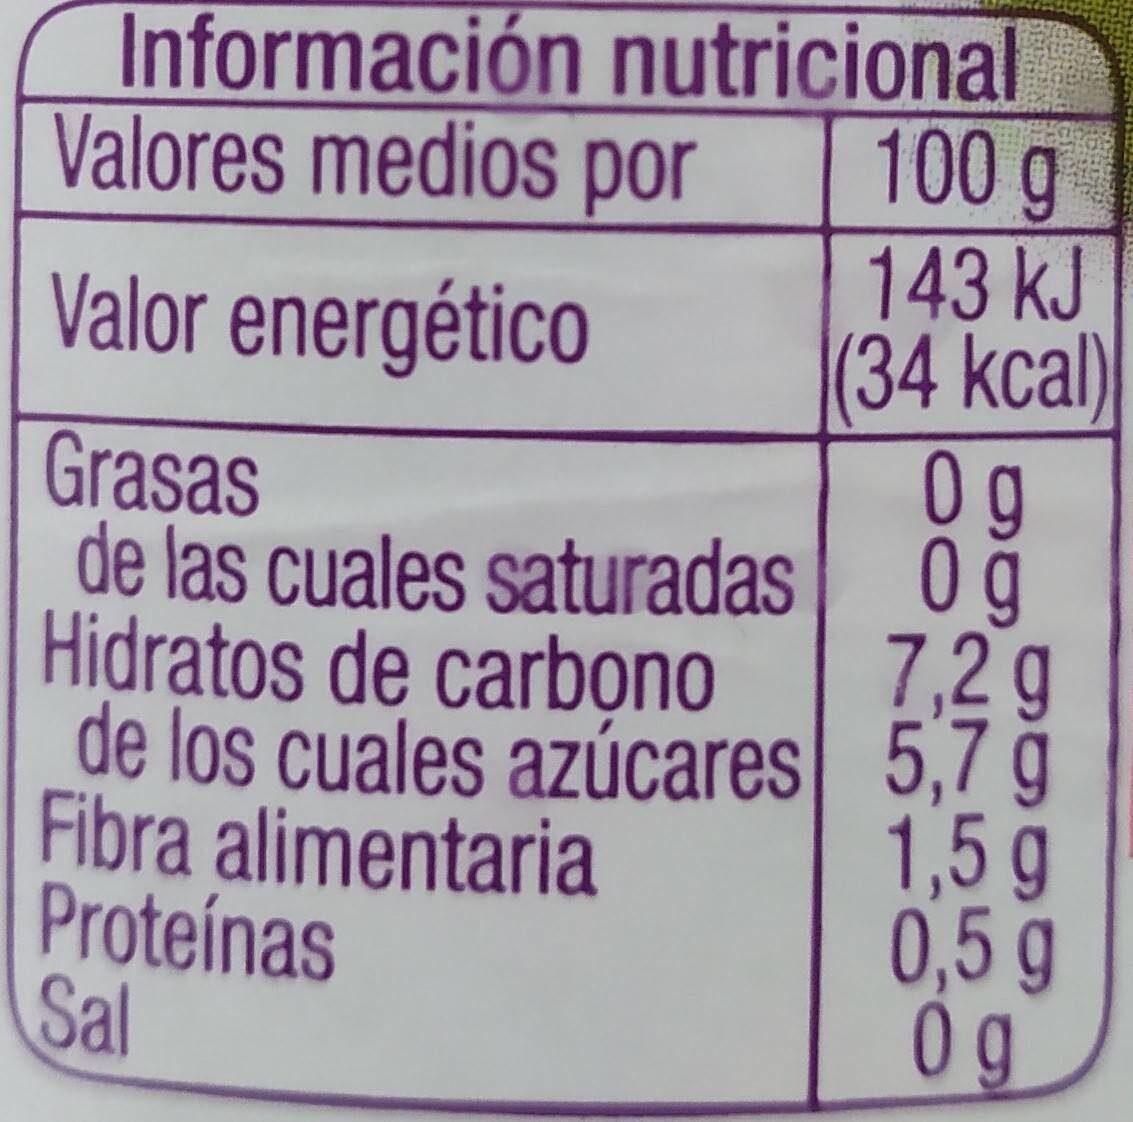 Mermelada Diet Ciruela - Informació nutricional - es